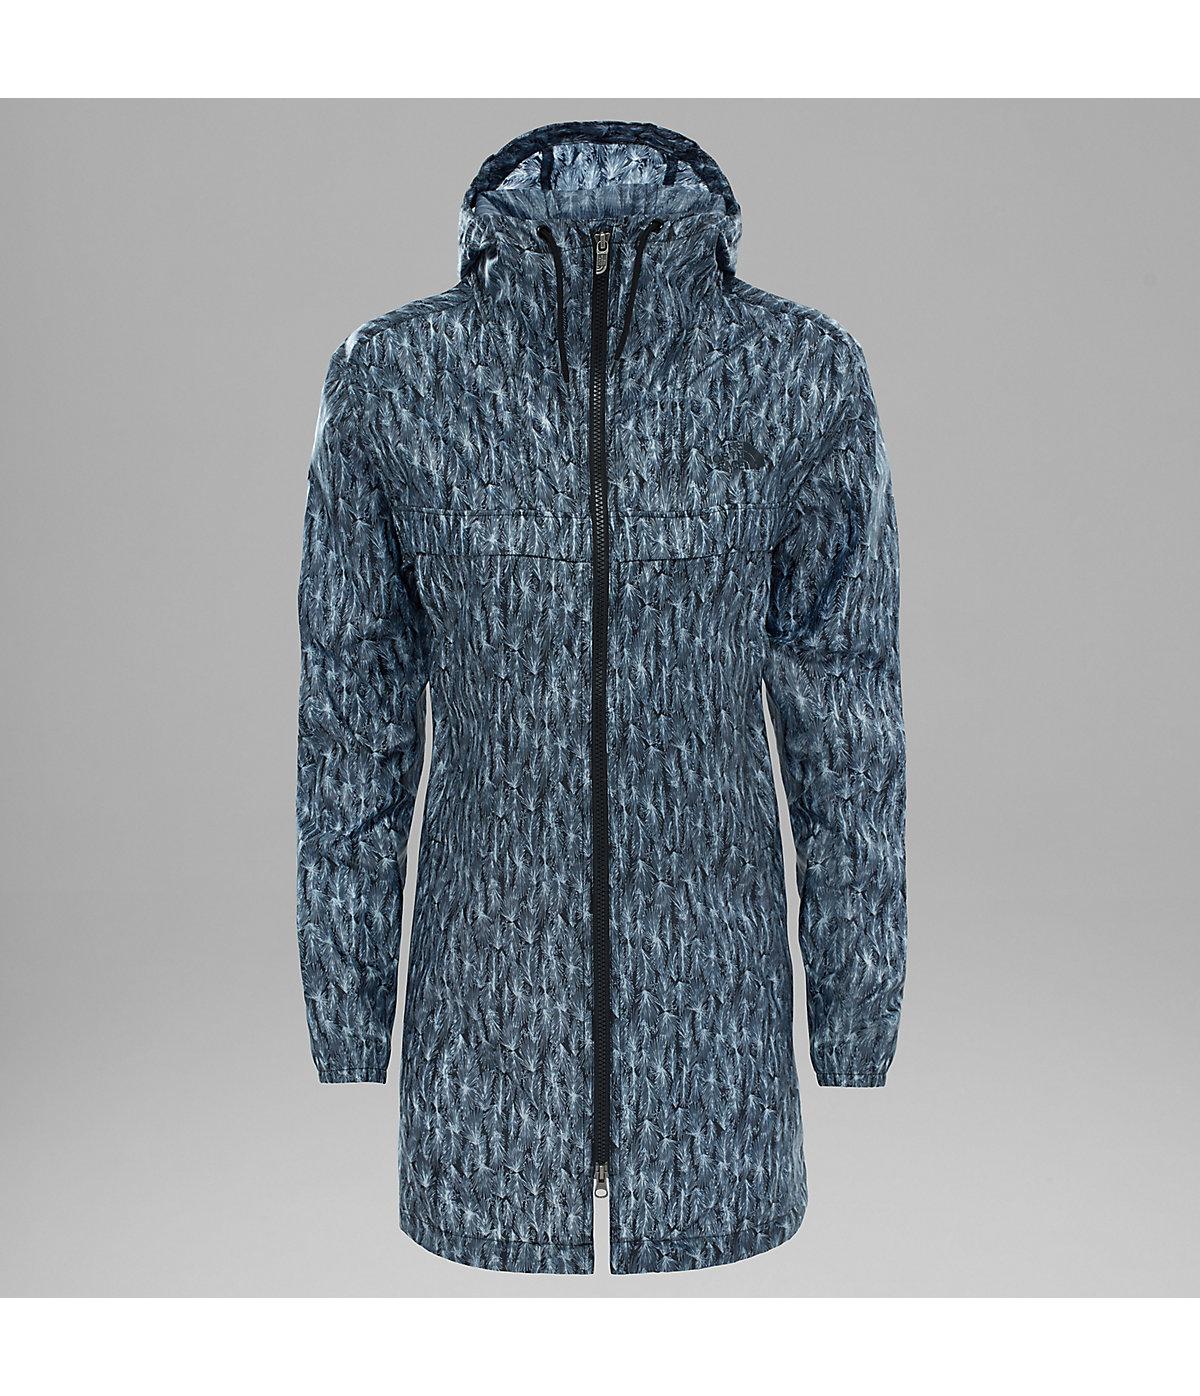 Куртка The North Face Cagoule Light Parka женская